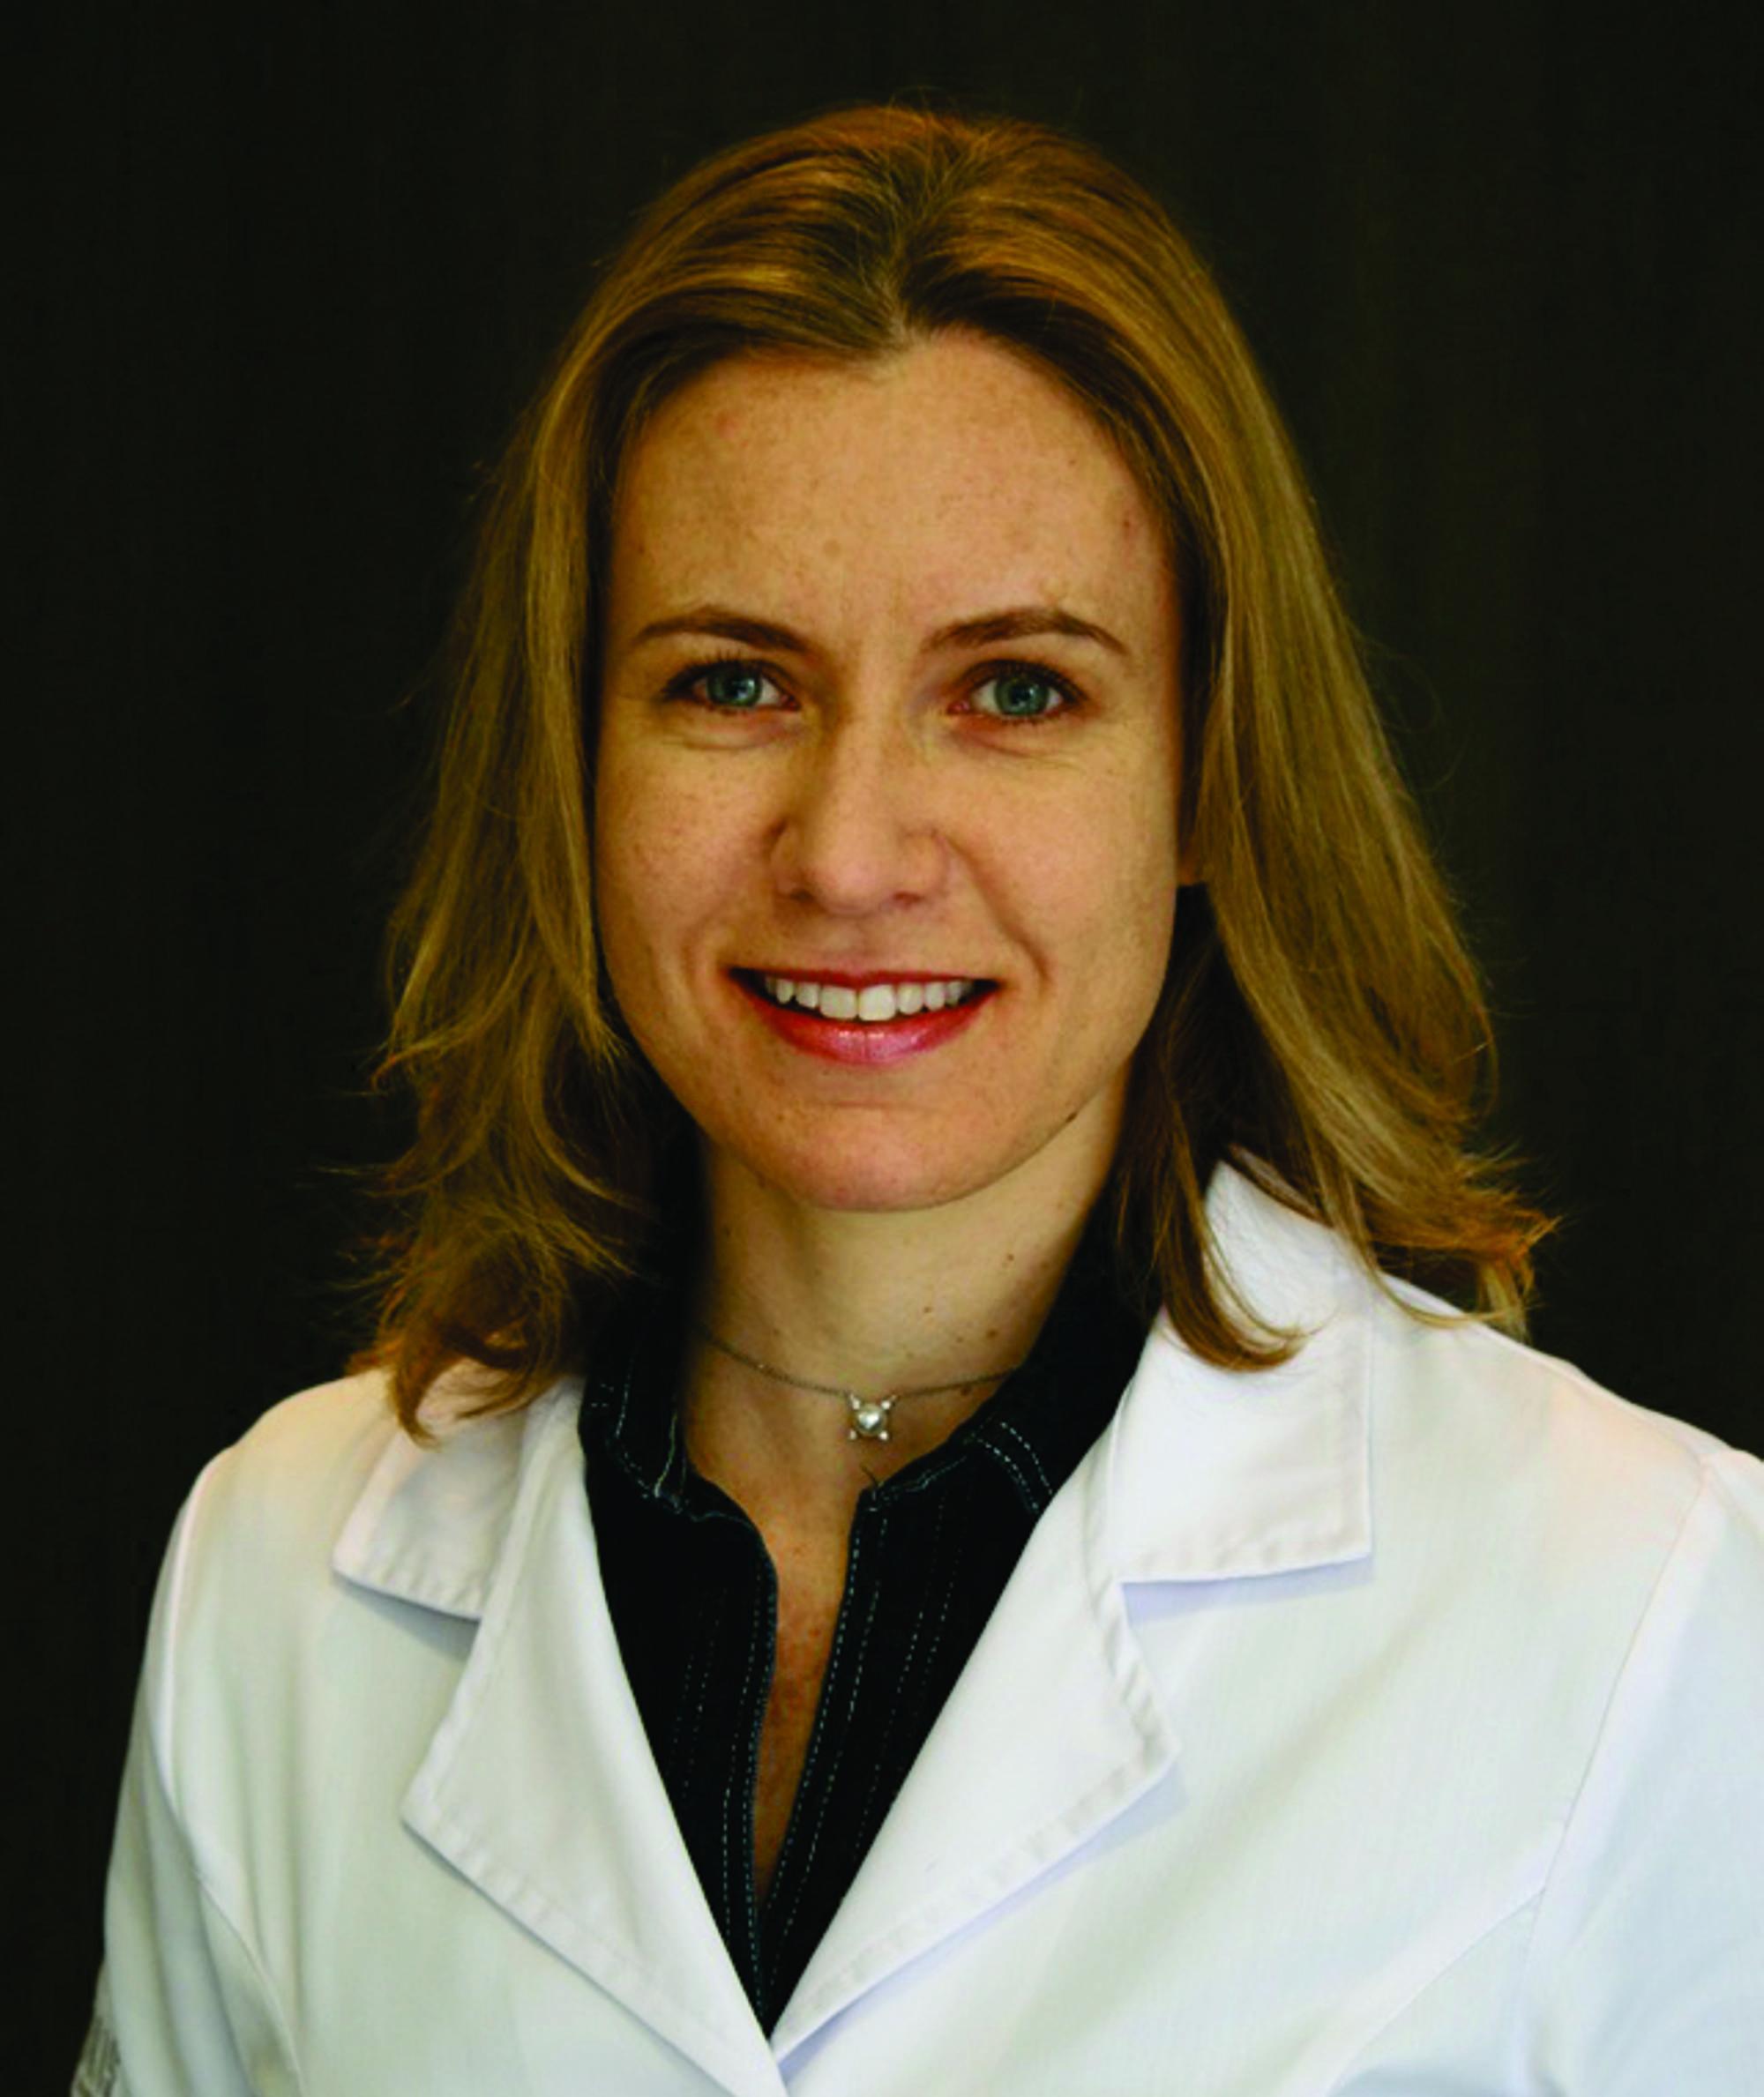 Dra. Claudia Dettmer, oftalmopediatra